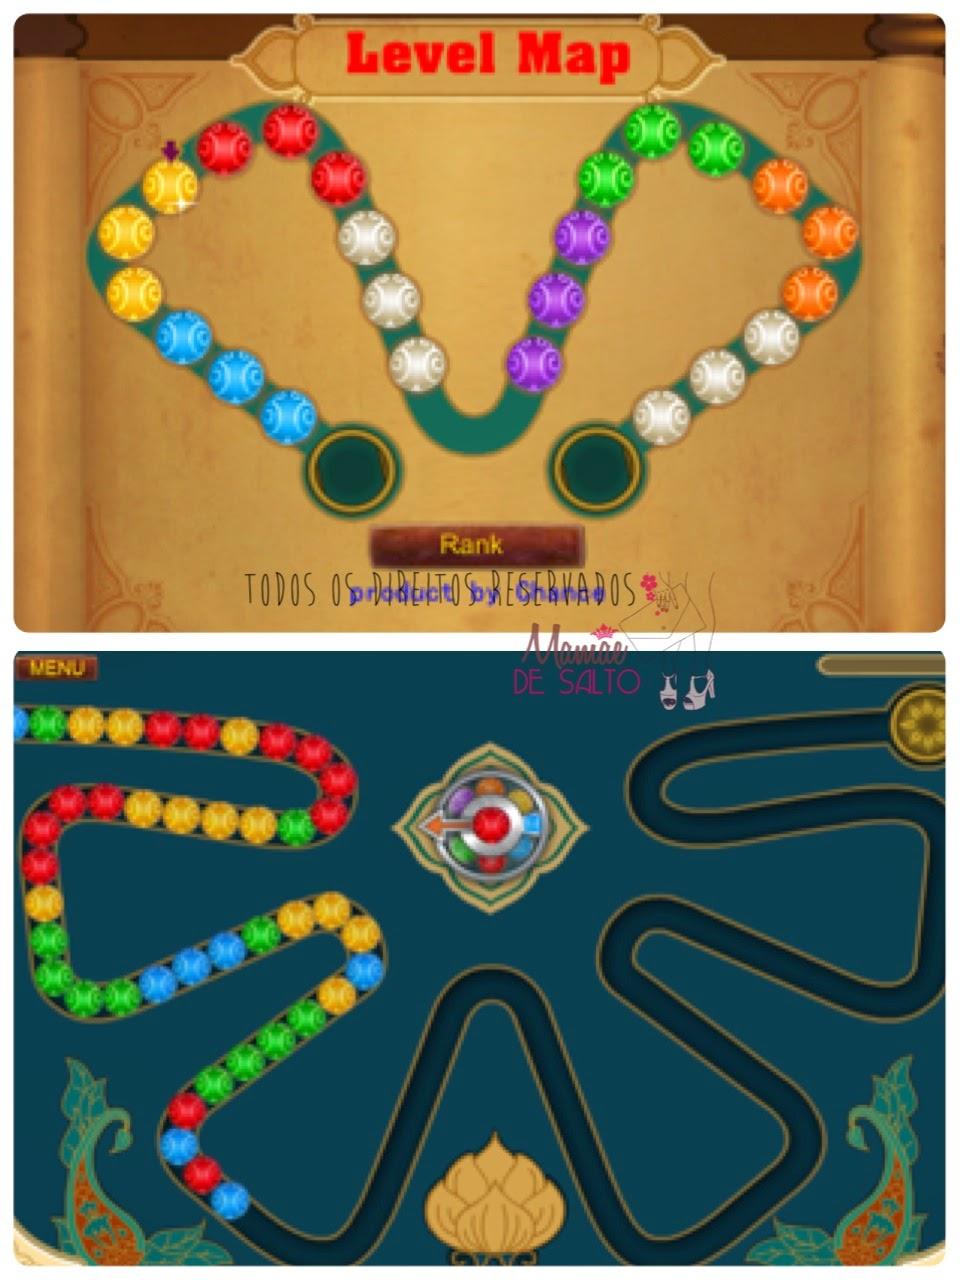 dica de aplicativo iphone e ipad jogos Candy Shoot - blog Mamãe de Salto